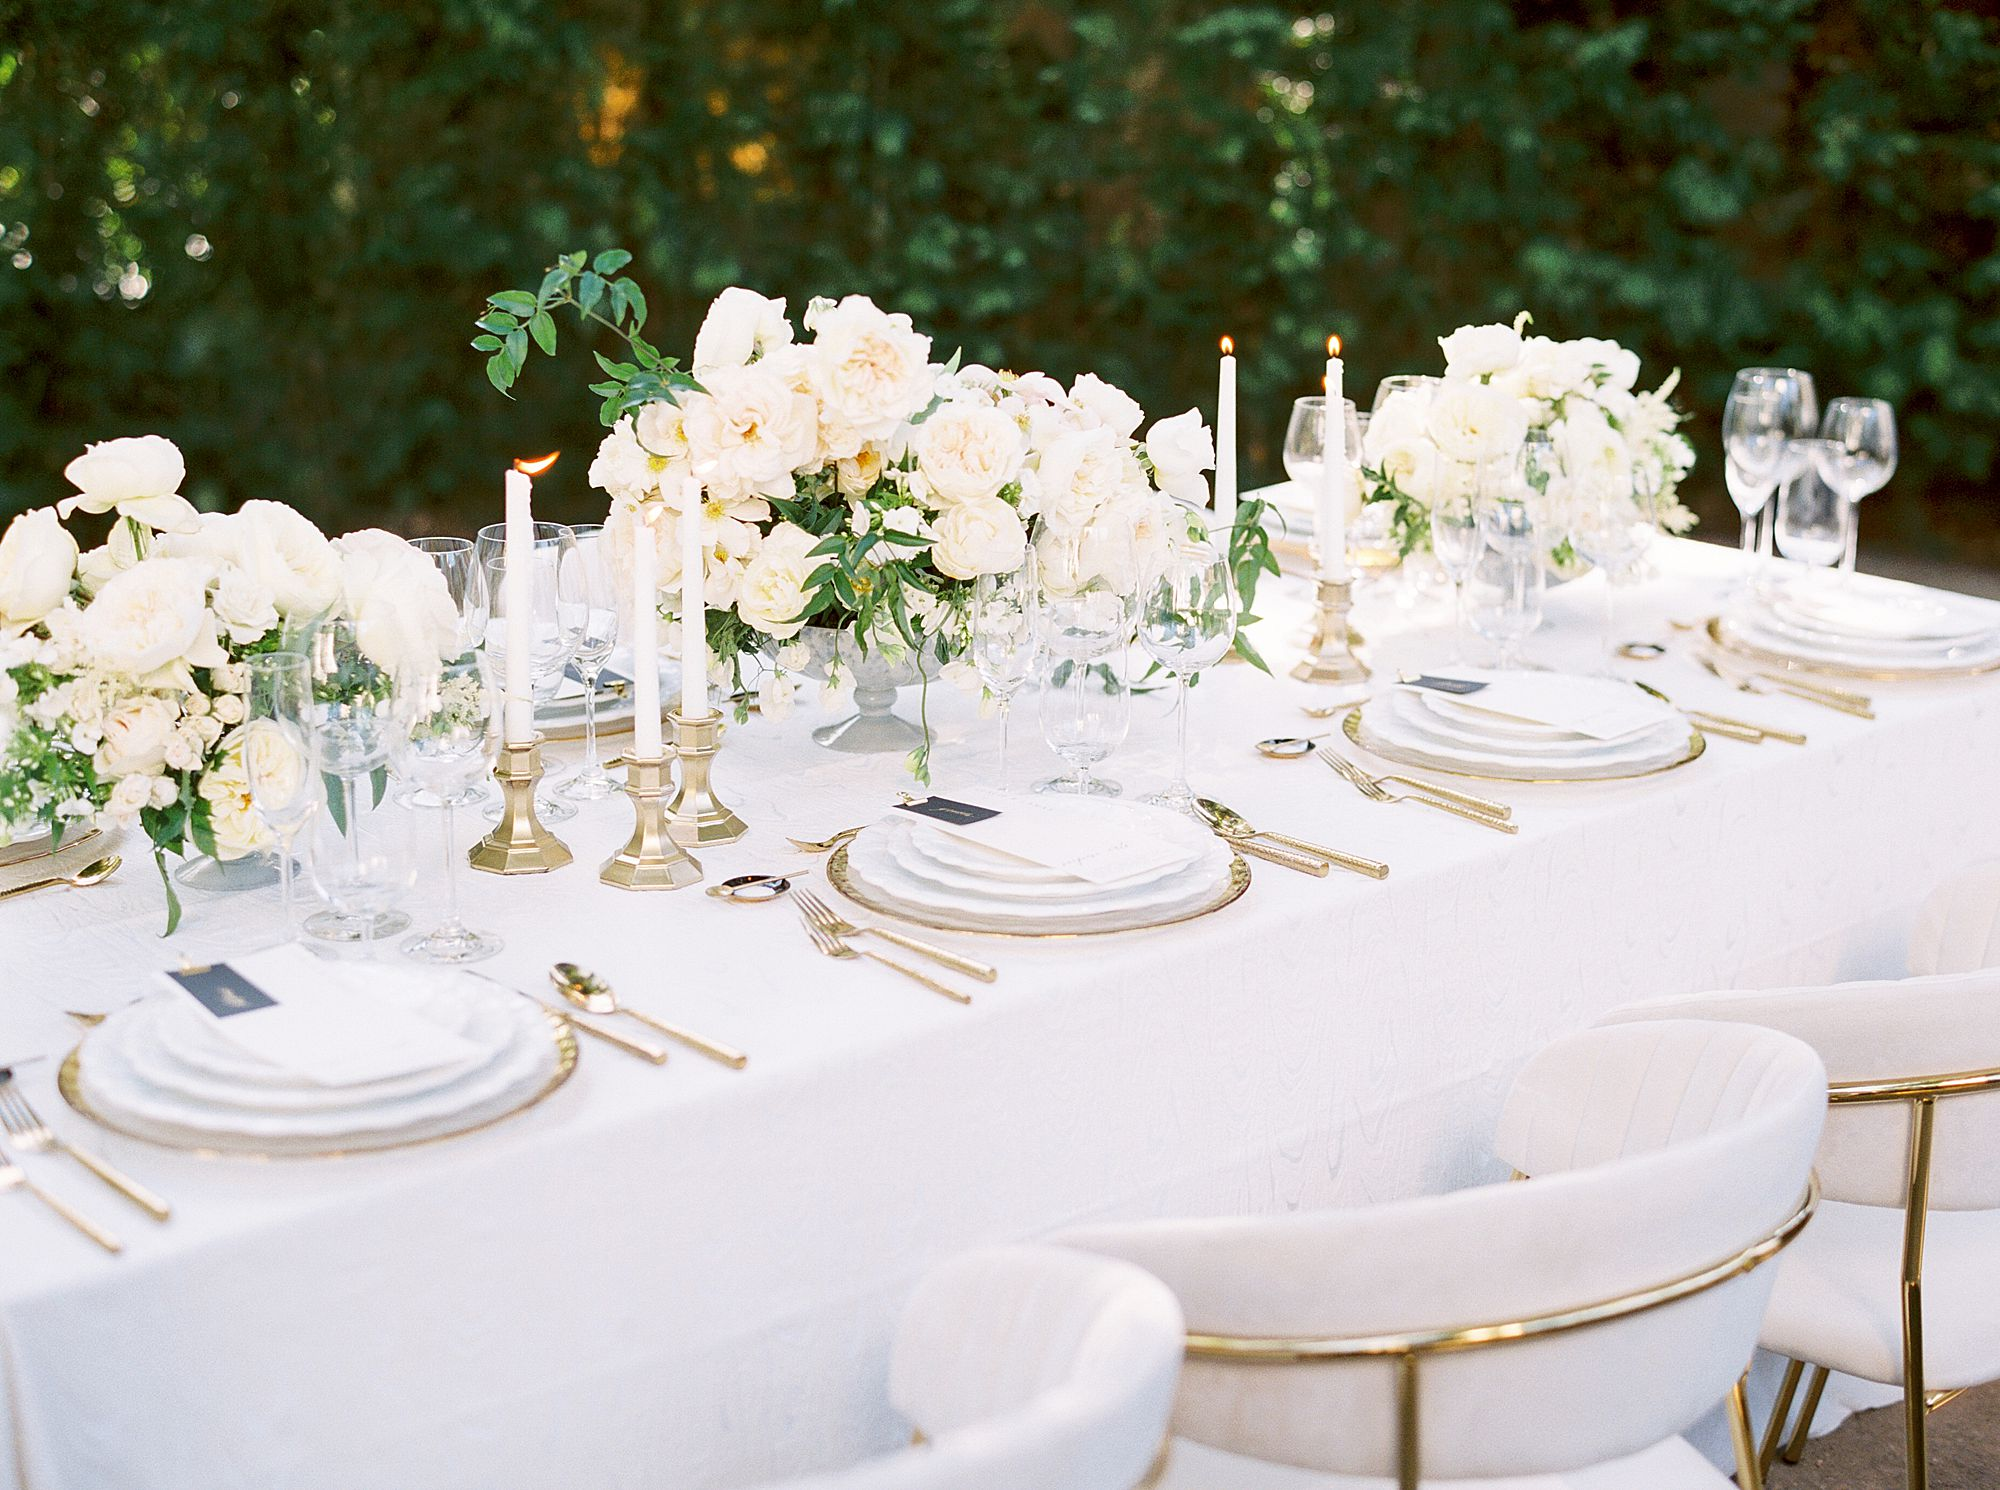 Park Winters Micro-Wedding Inspiration on Style Me Pretty - Stephanie Teague Events - Ashley Baumgartner - Park Winters Wedding - Black Tie Wedding - Micro-Wedding Sacramento Photographer_0066.jpg